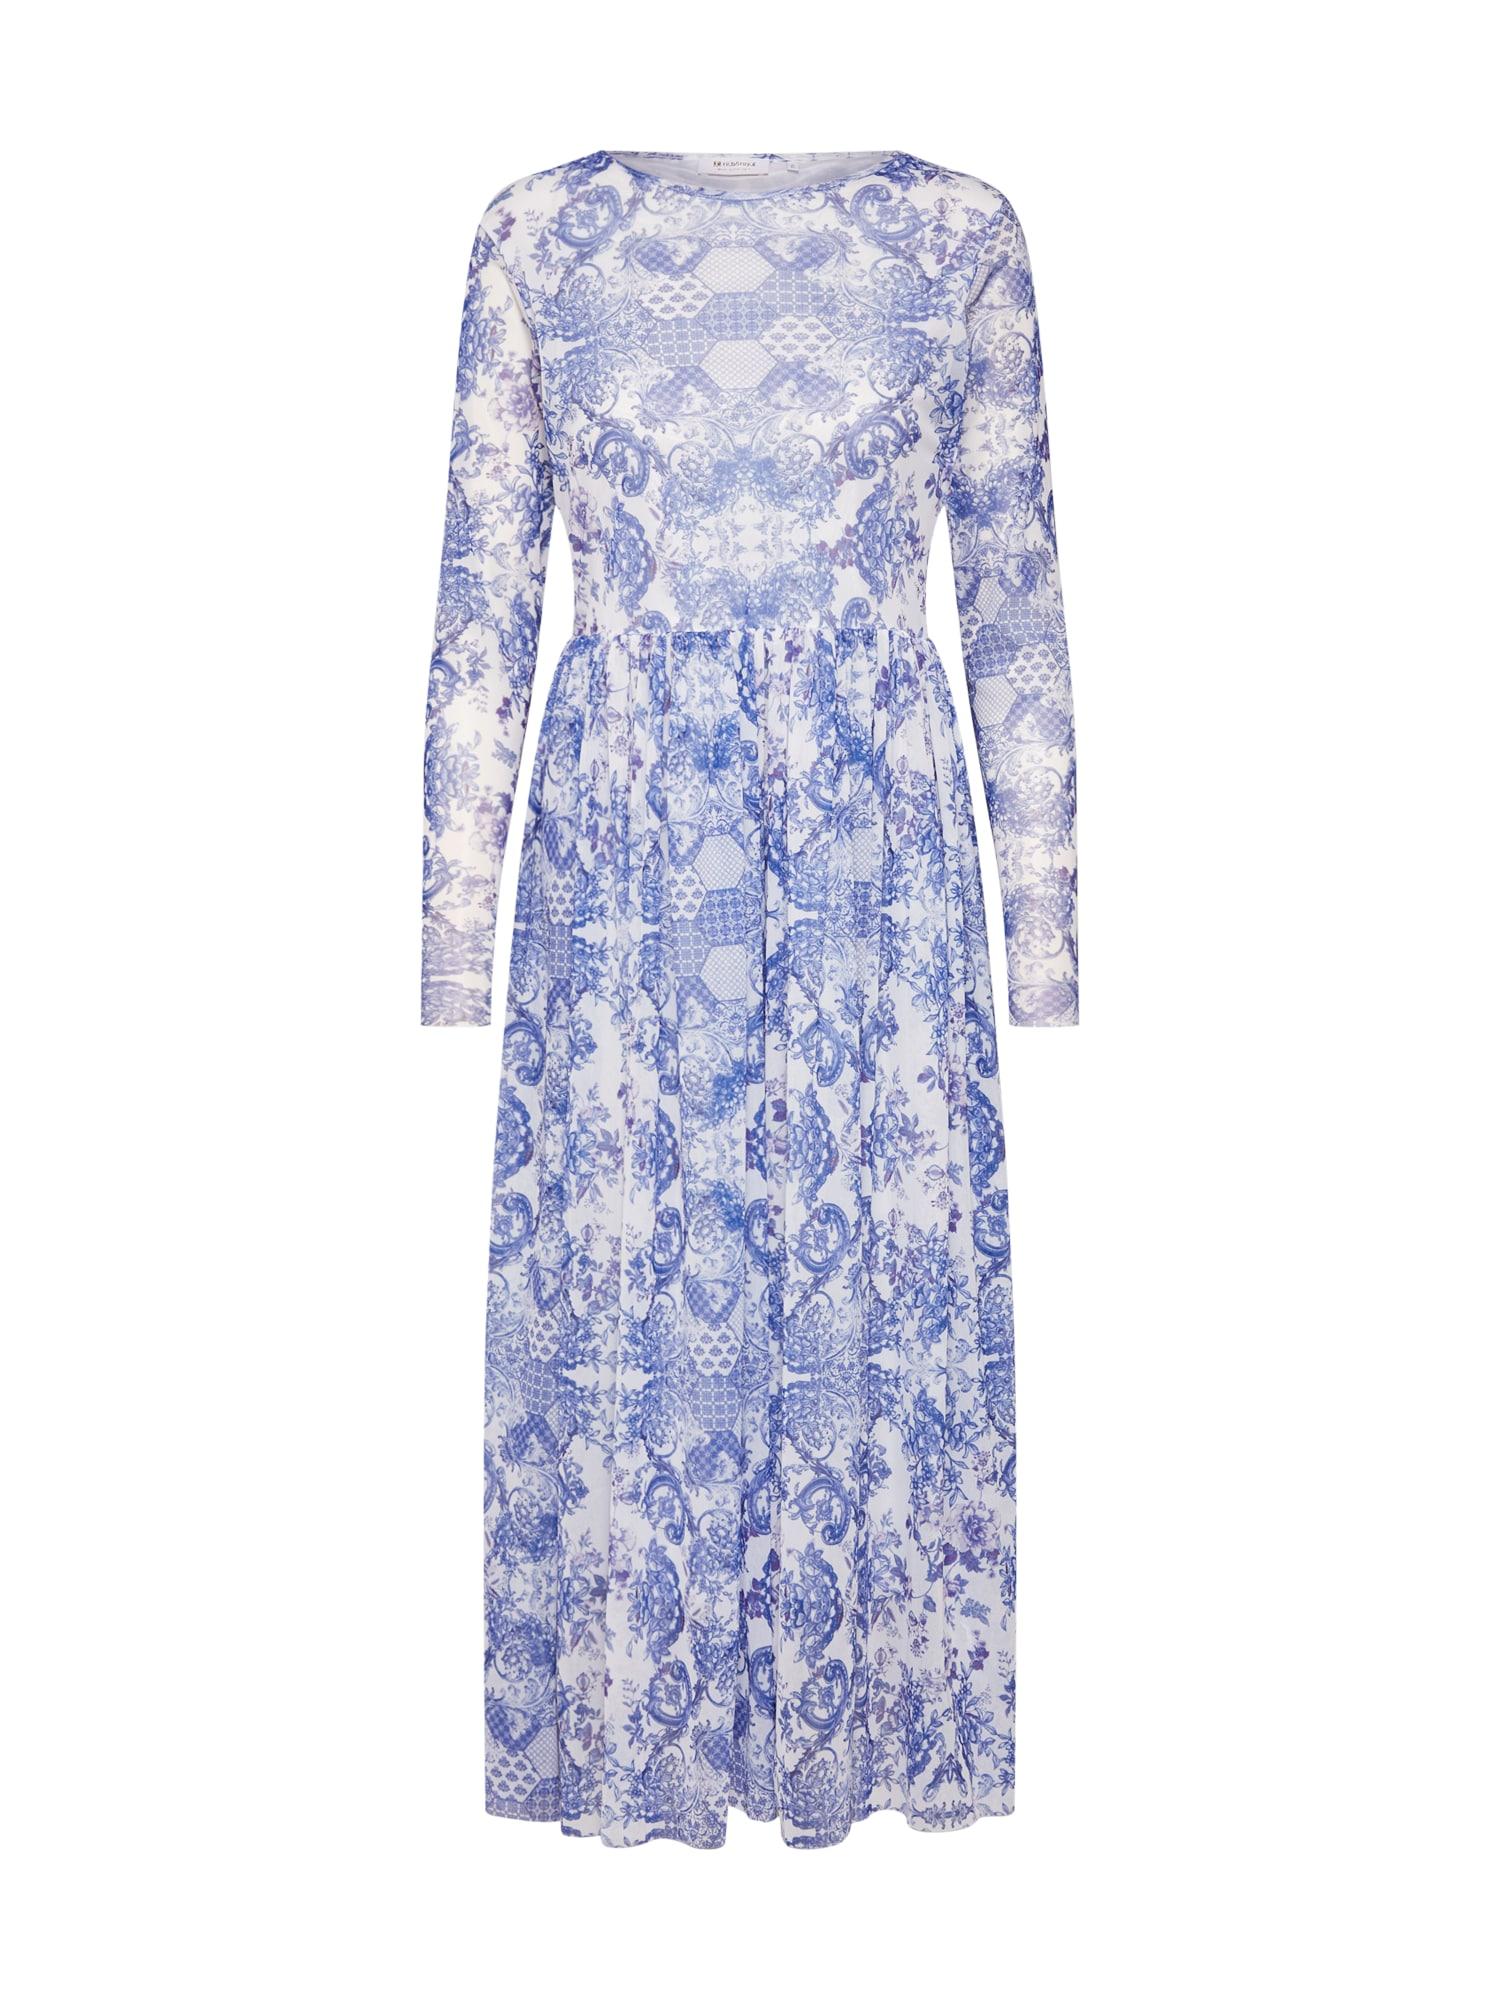 Šaty modrá mix barev bílá Rich & Royal